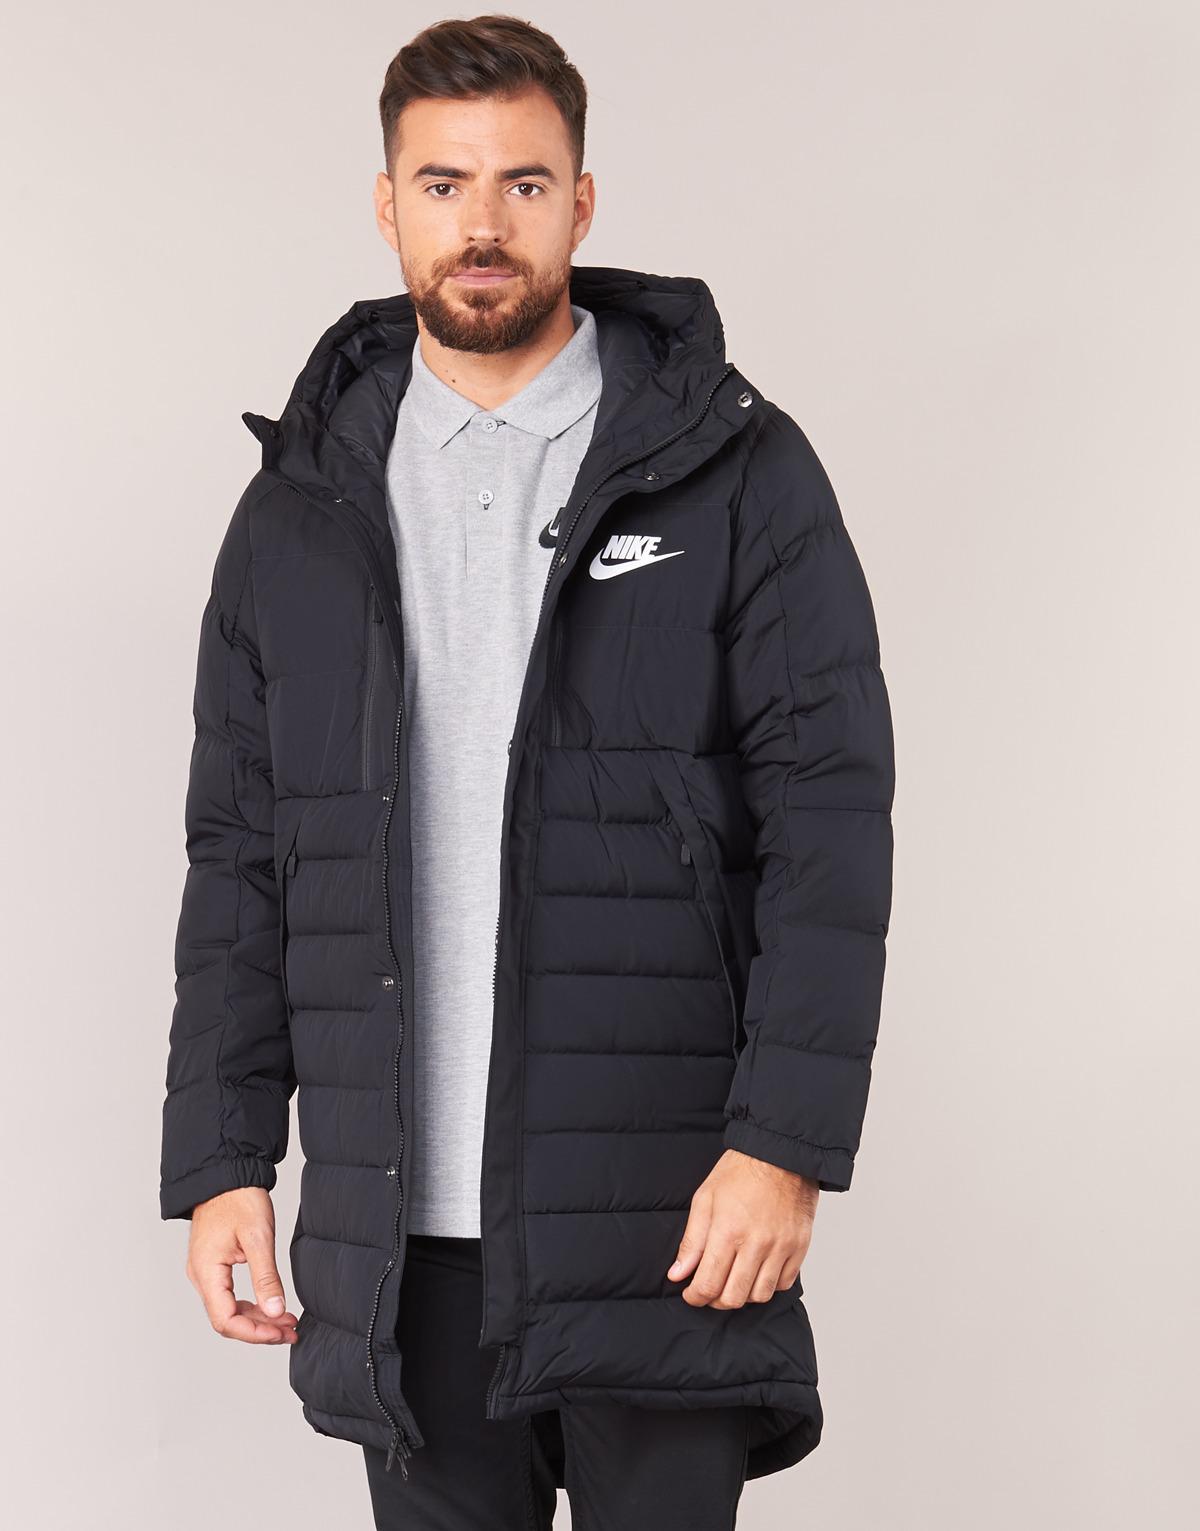 c933d226 Nike Down Fill Parka Men's Jacket In Black in Black for Men - Lyst